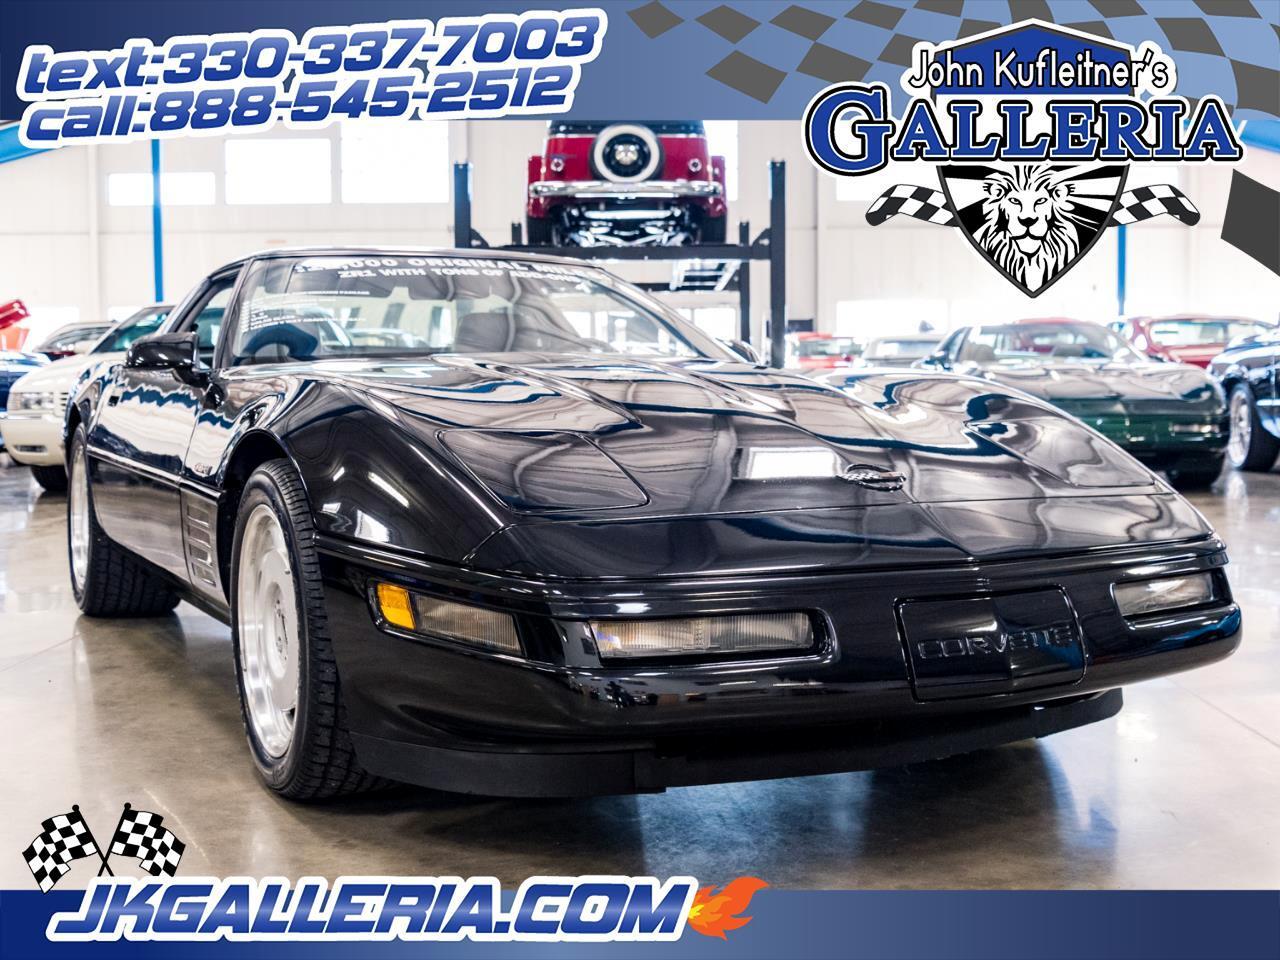 Chevrolet Corvette 2dr Cpe ZR1 w/3ZR 1991